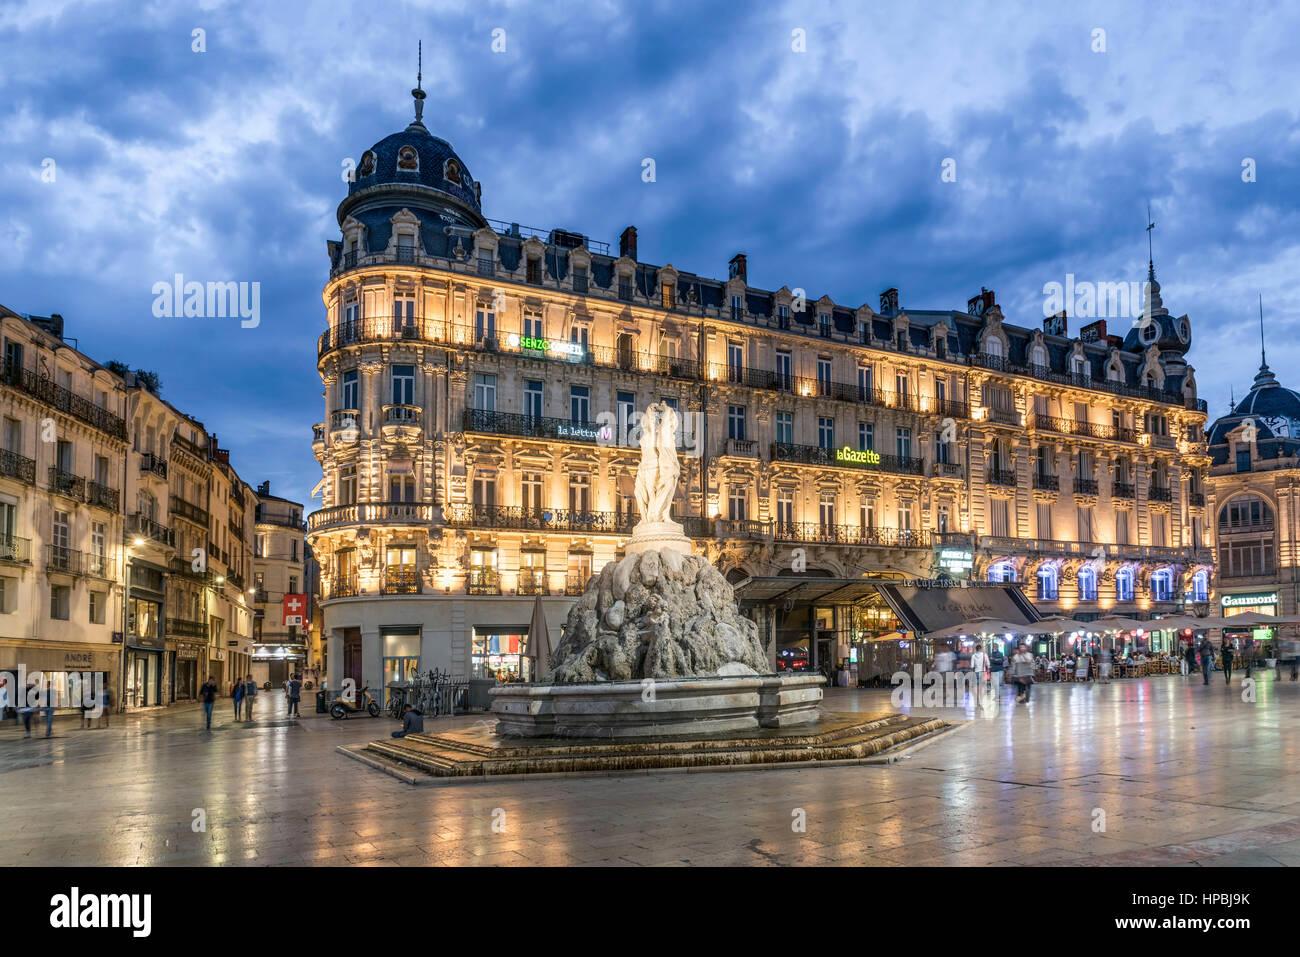 Place de la Comedie, Three graces fountain, Montpellier, France, Stock Photo